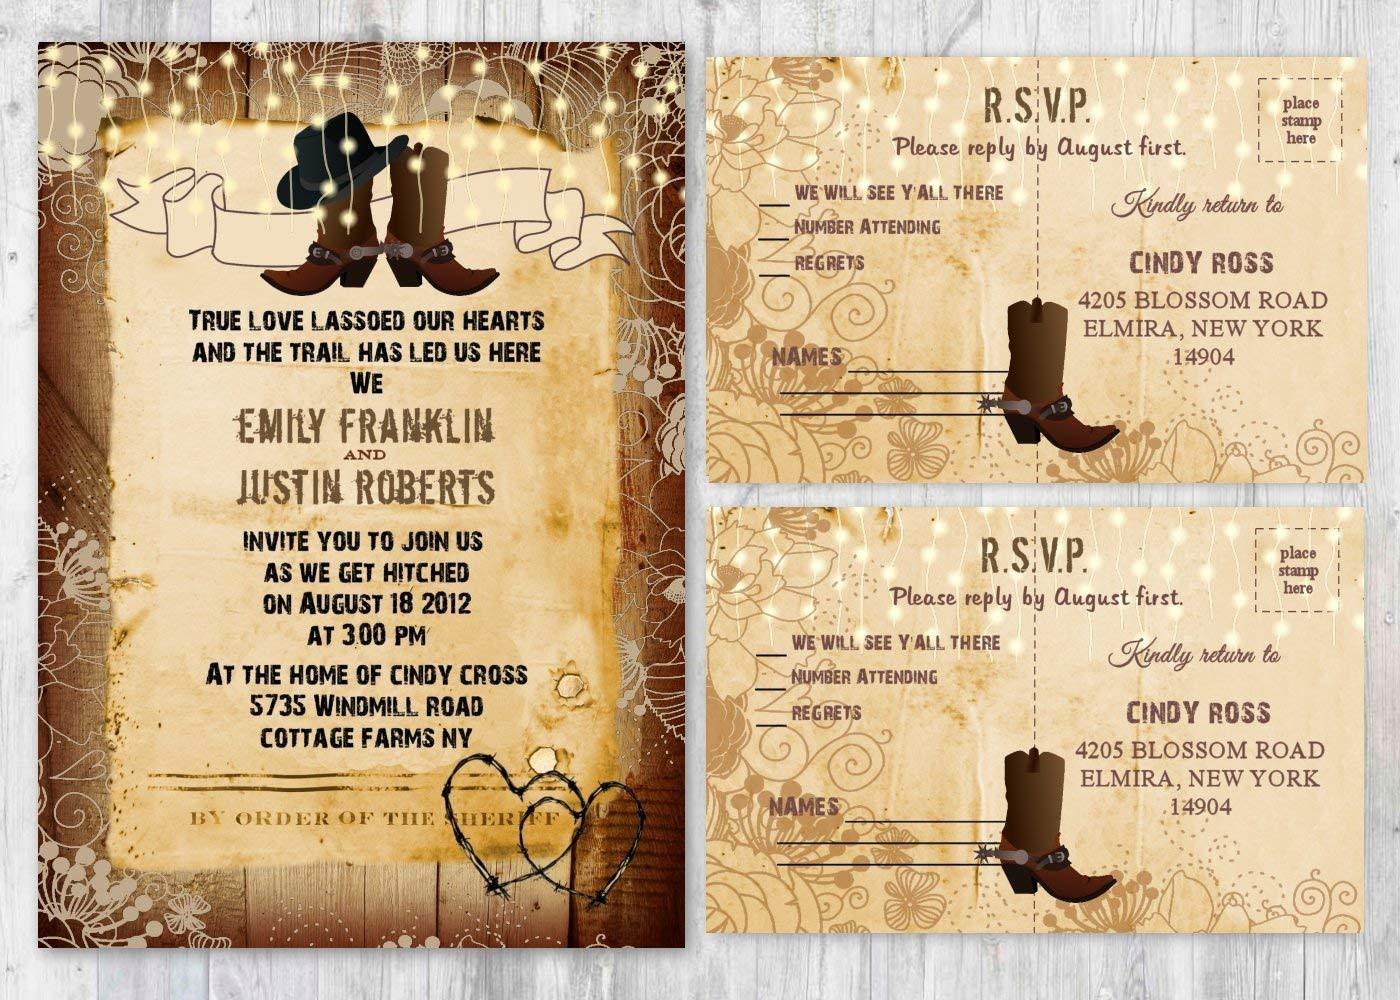 Amazon.com: Western Wedding Invitations With Matching Card Set of 100:  Handmade